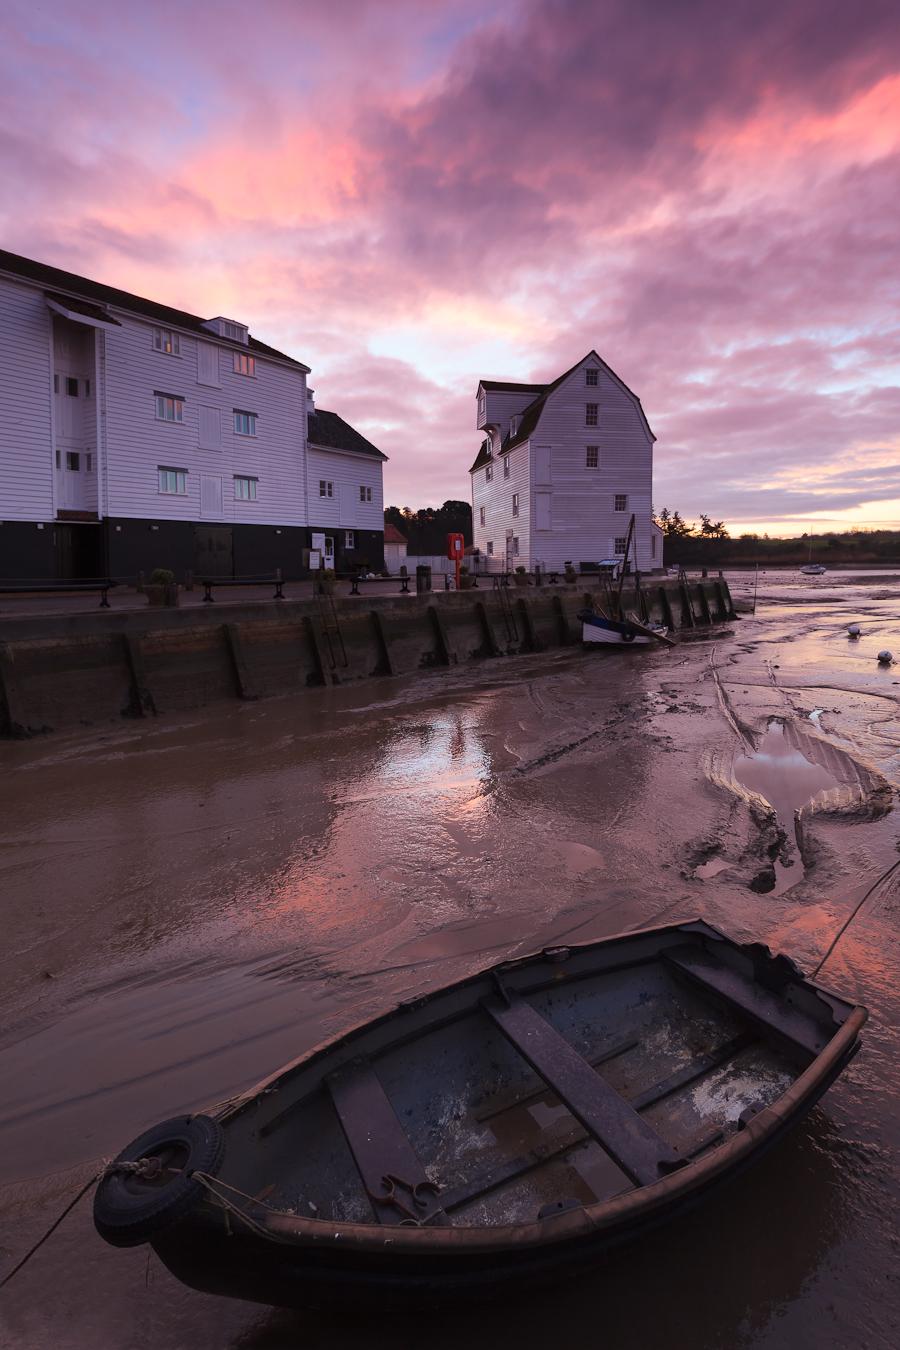 Woodbridge Tide mill, Suffolk at sunrise